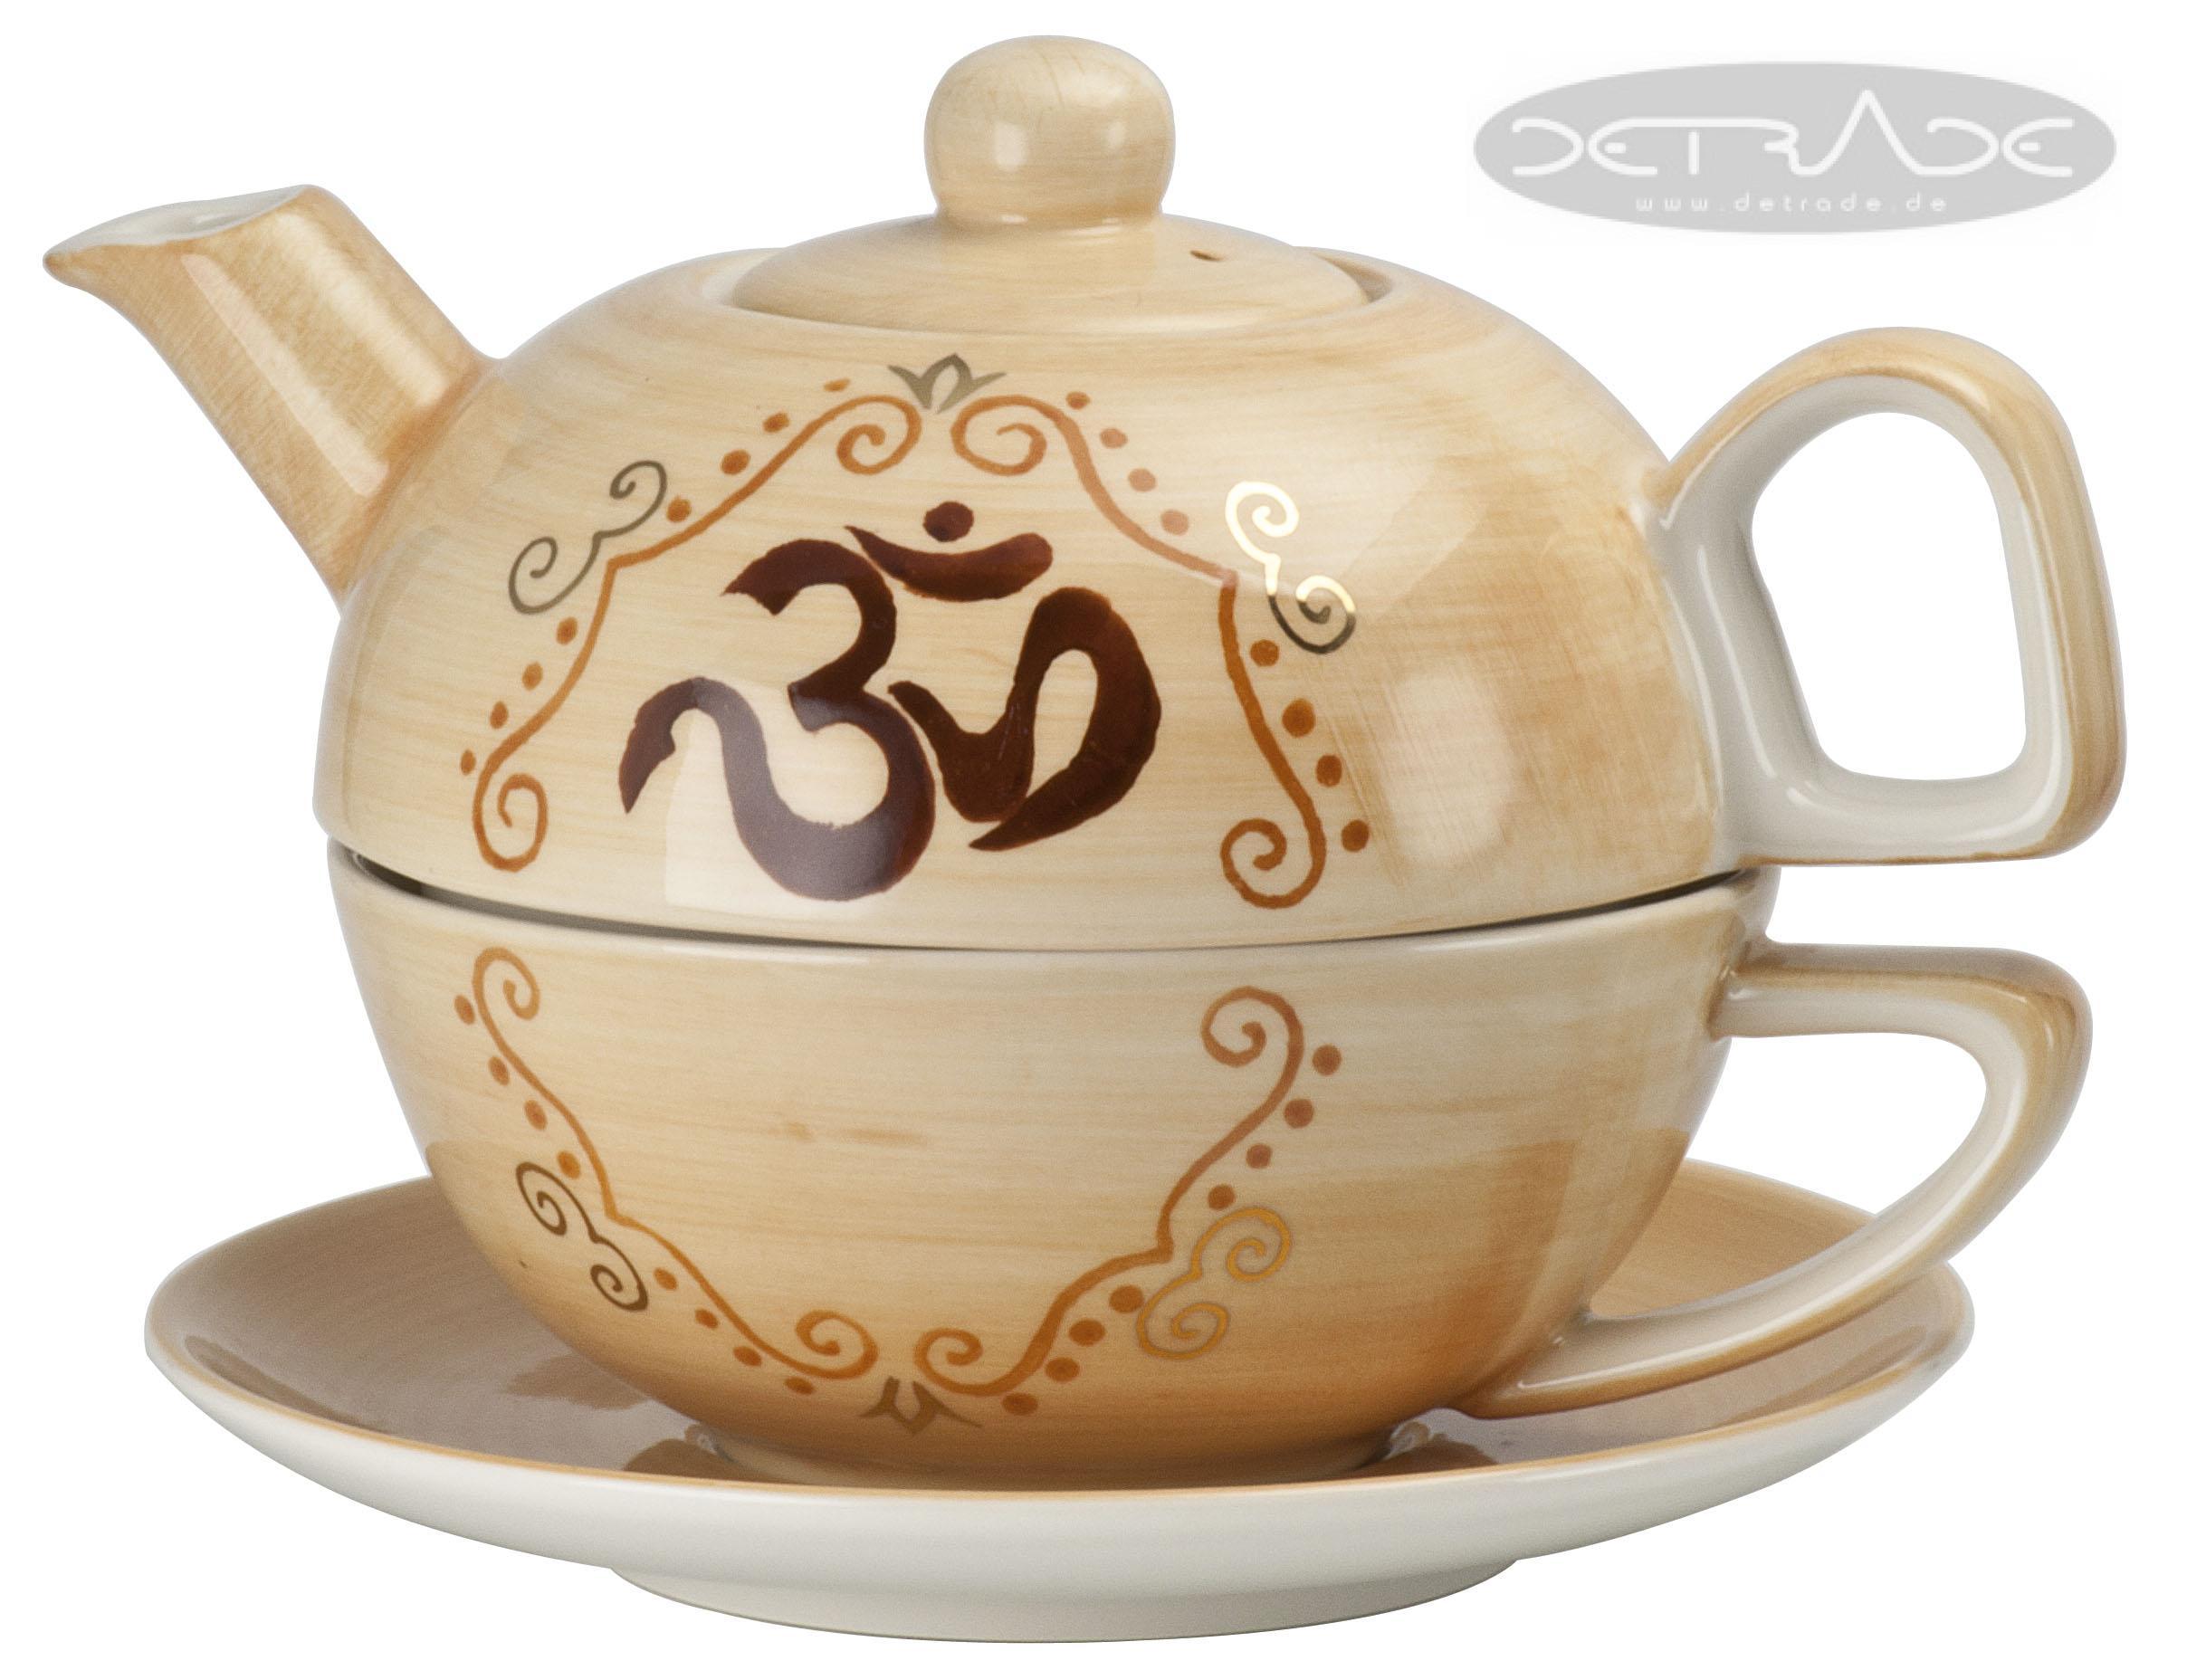 india tea for one set teeservice teekanne teetasse porzellan. Black Bedroom Furniture Sets. Home Design Ideas